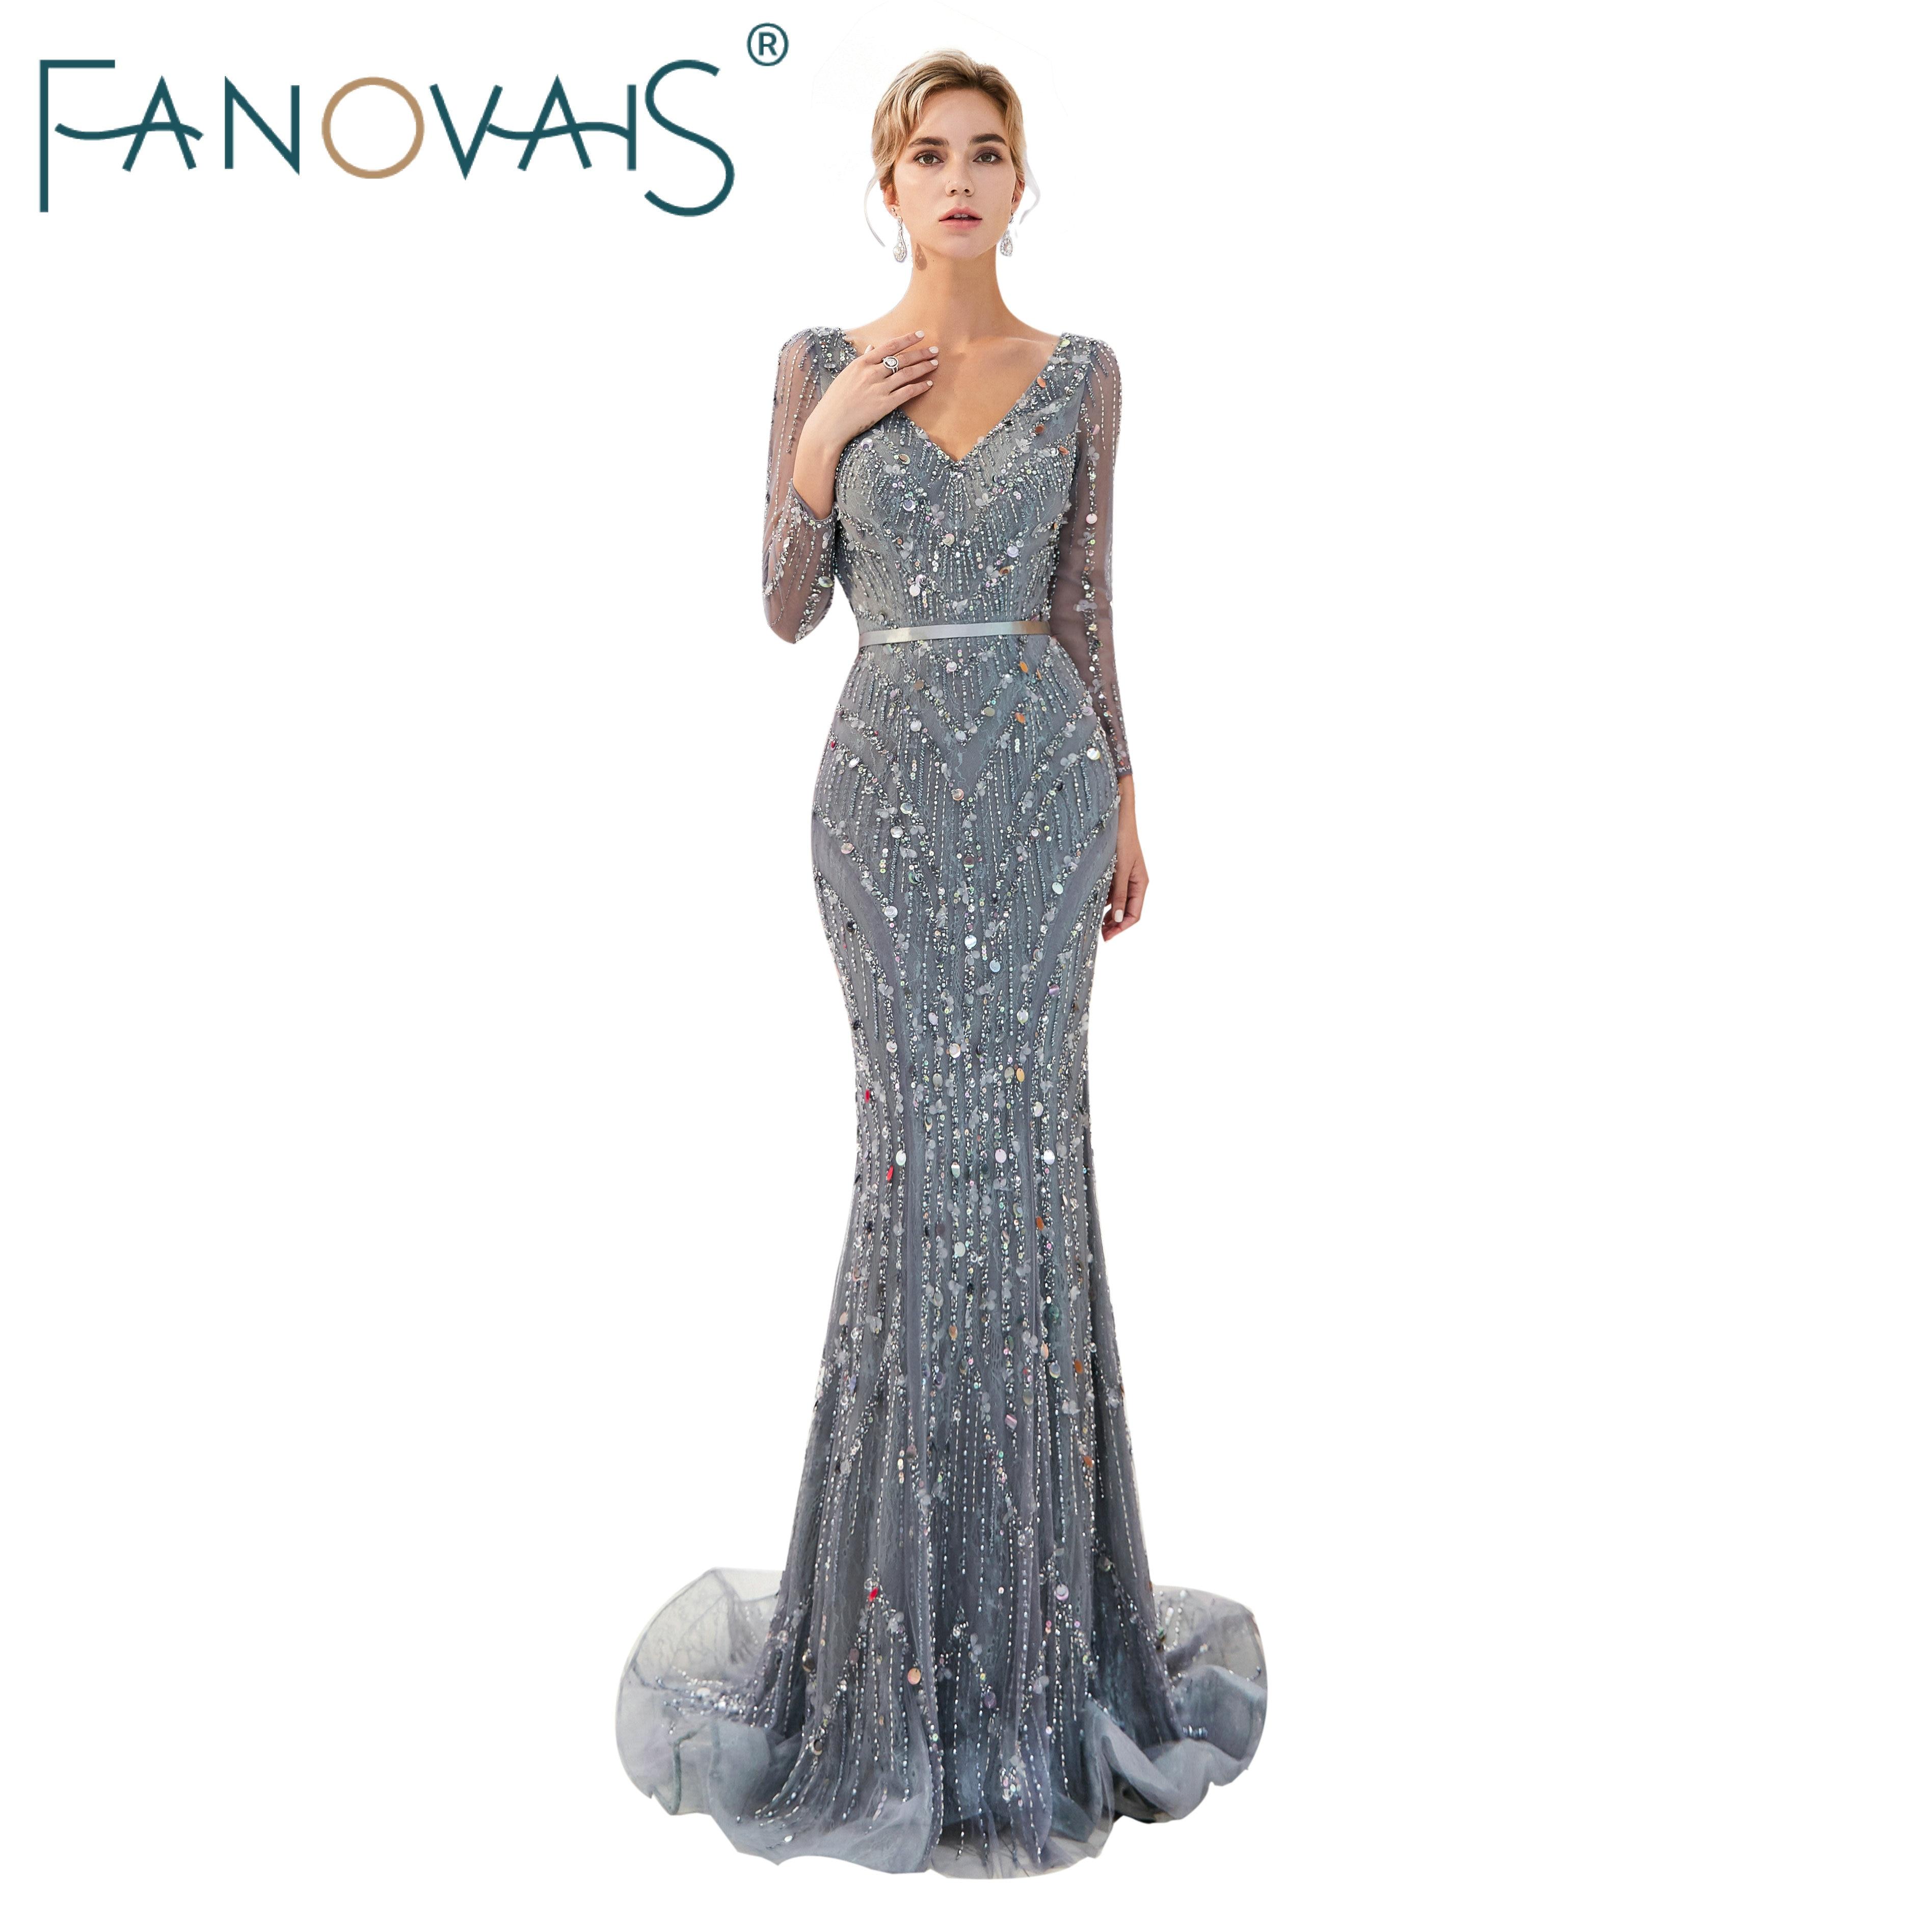 Luxury Evening Dress with Long Sleeves Silver Gray Evening Gowns Vestido De Festia Sexy Night Dress Formal Dress Long 2019 gown